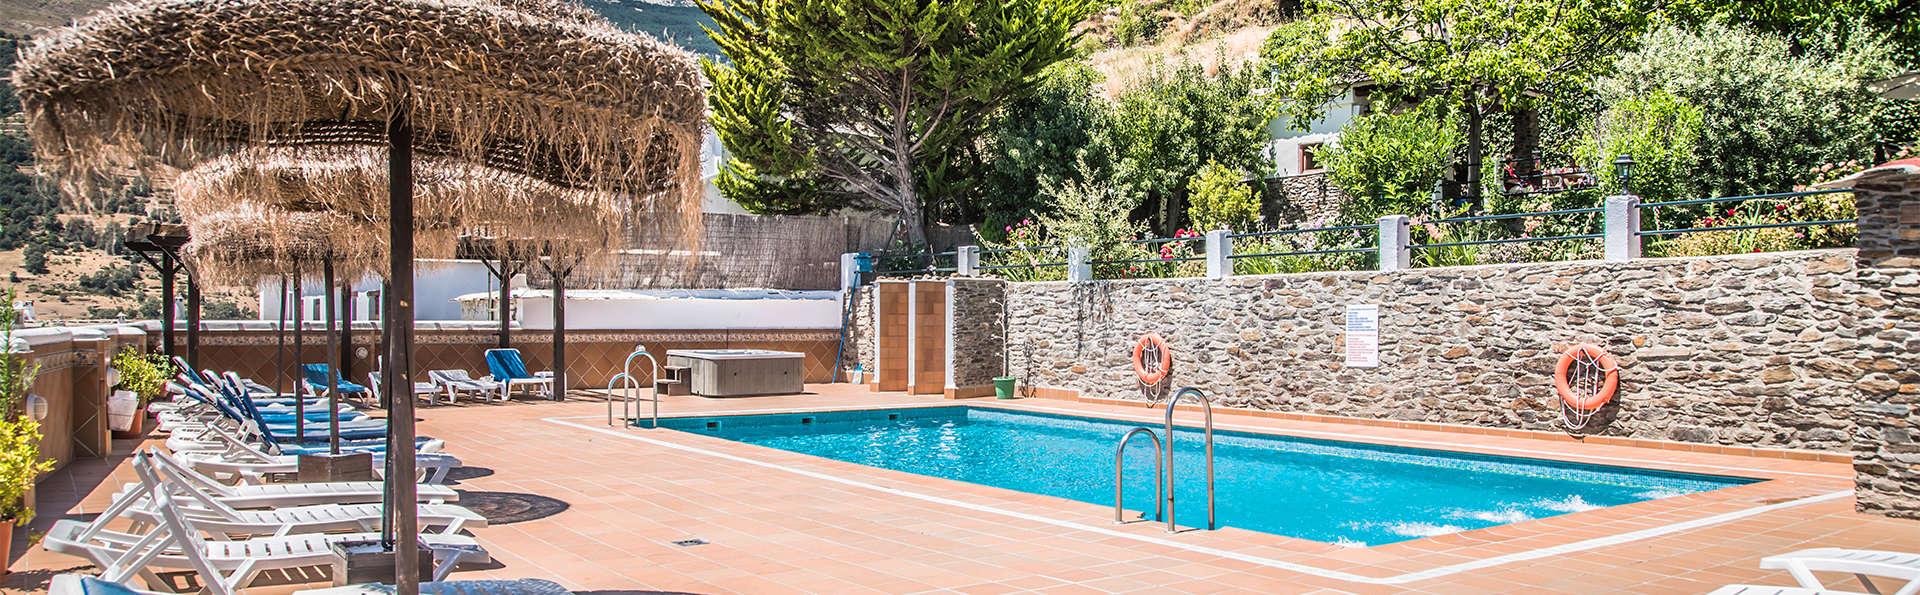 Hotel Rural Finca Los Llanos - EDIT_15_EXT.jpg